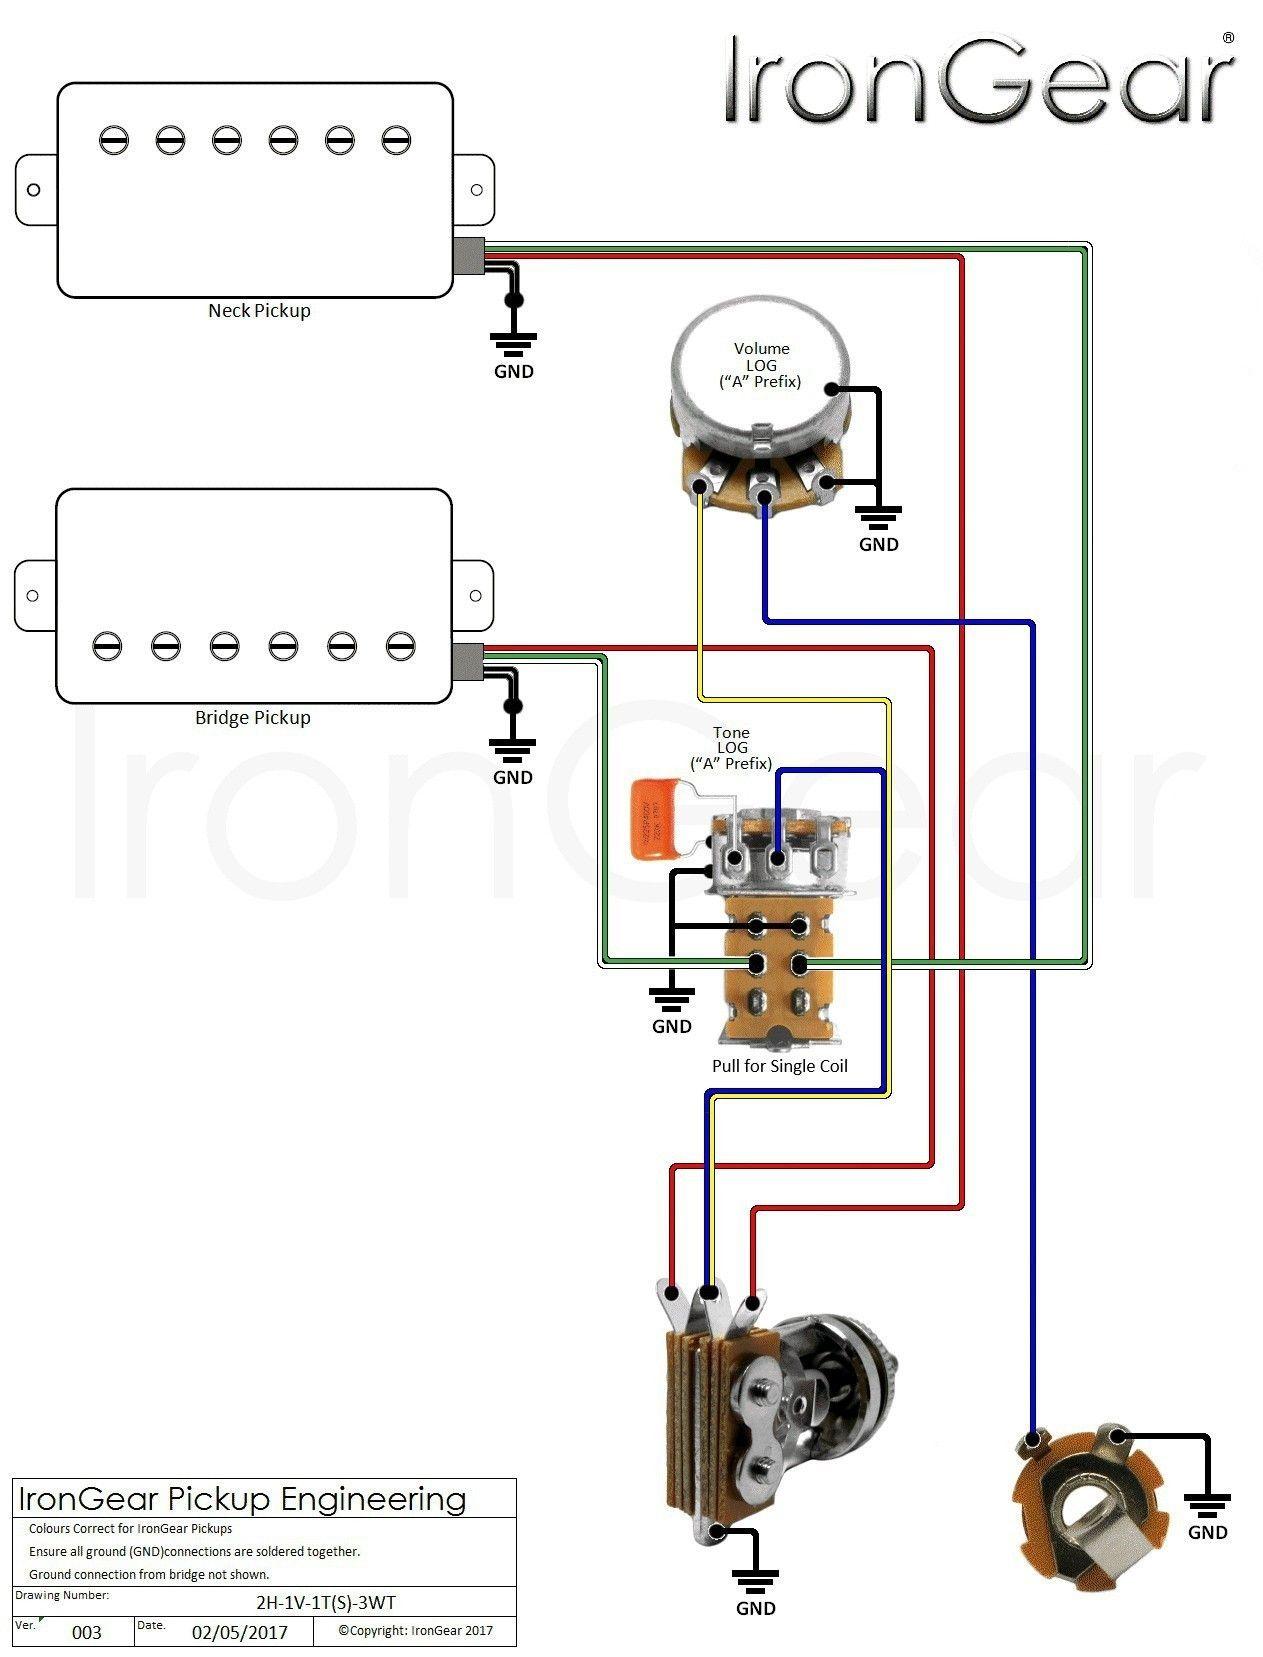 Unique Wiring Diagram Active Pickups Diagram Diagramtemplate Diagramsample Diagram Design Wire Diagram